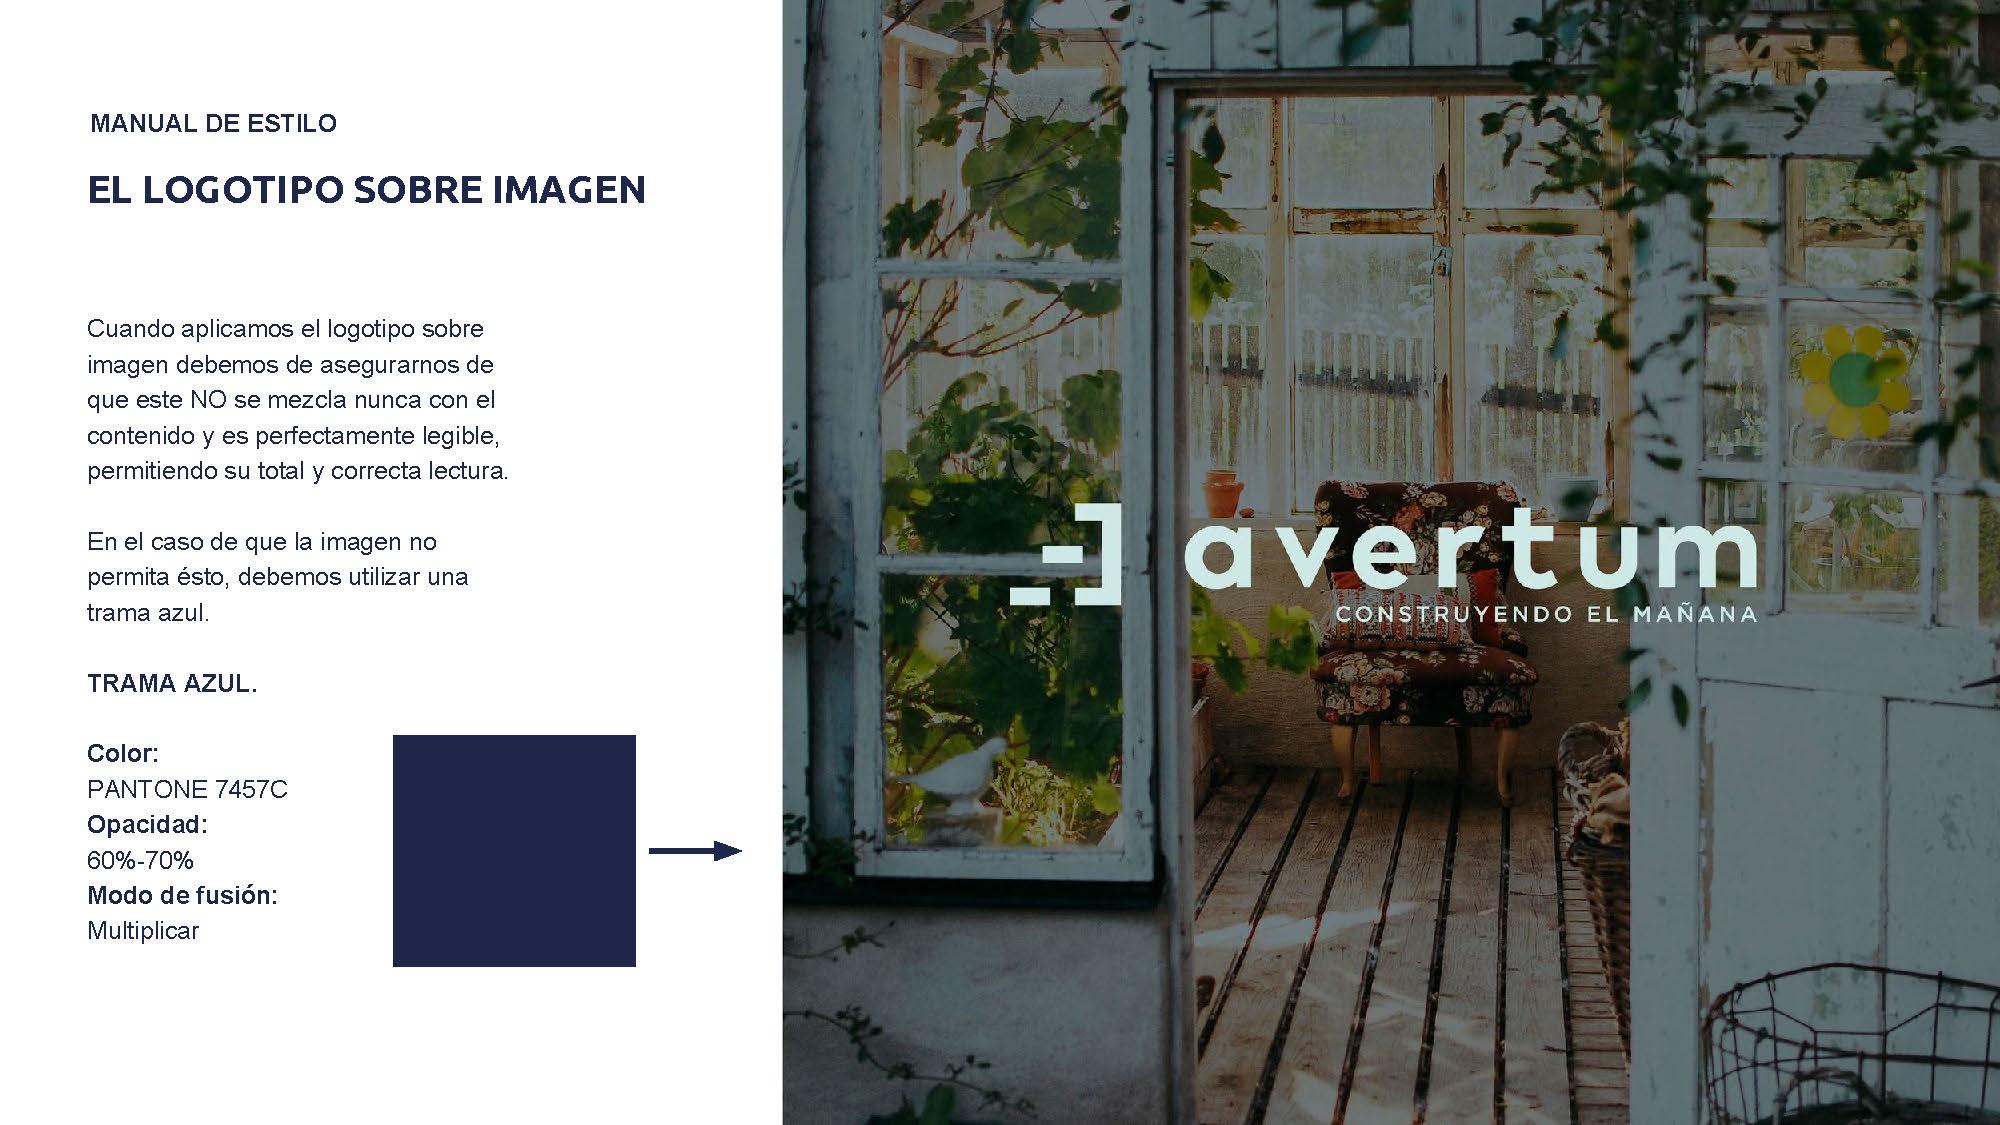 Logtipo sobre imagen de Avertum by Reaktiva